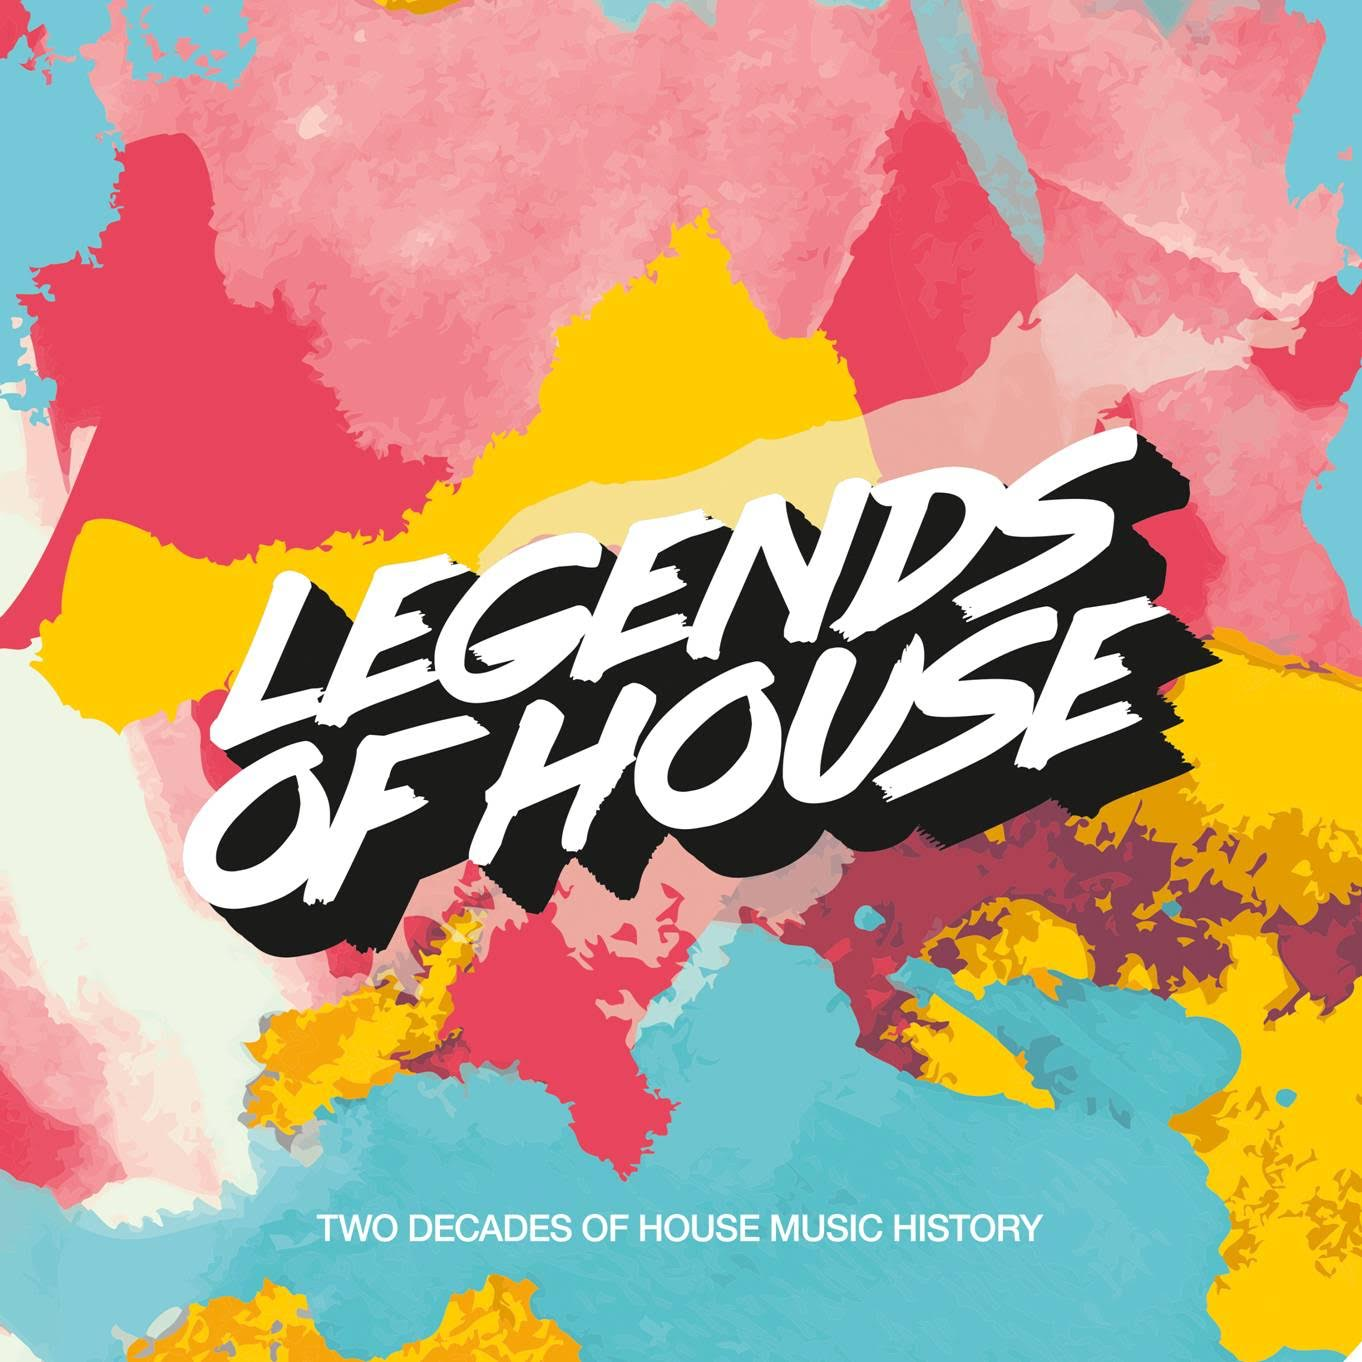 milk_sugar_-_legends_of_house_-_artwork.jpg